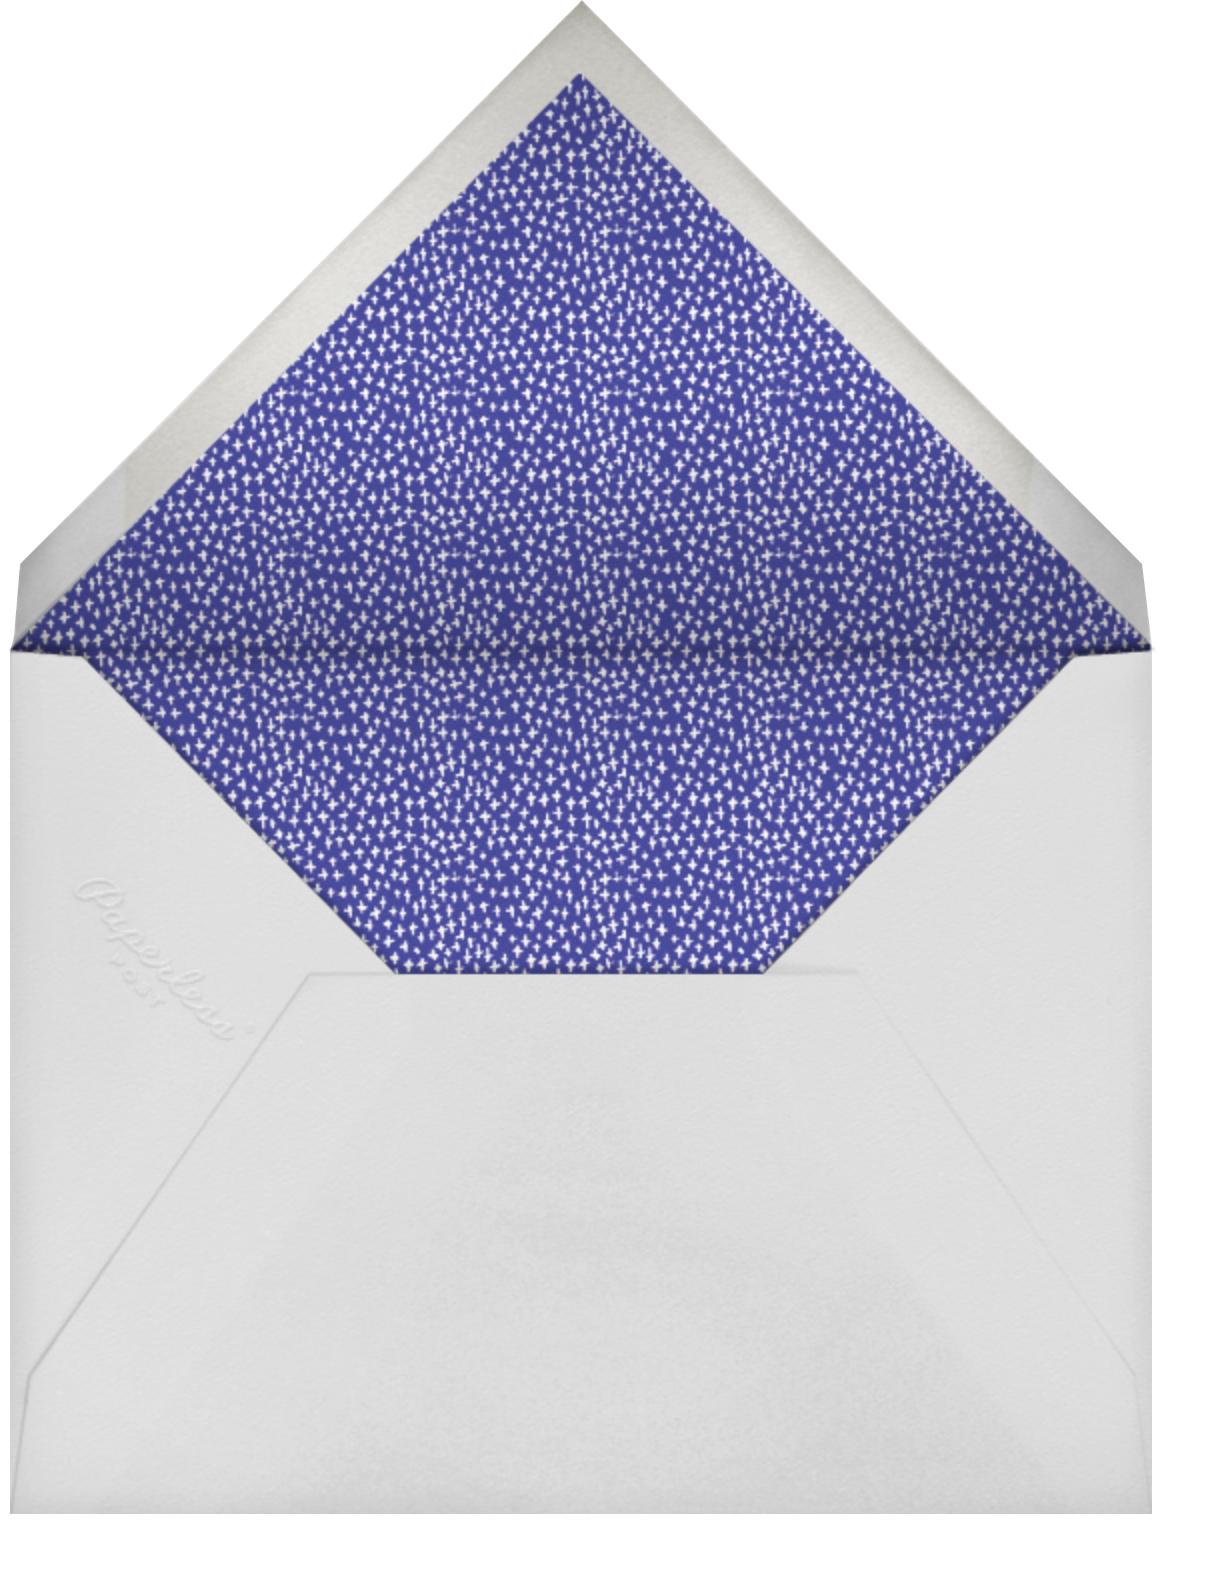 Stable Table - Mr. Boddington's Studio - Just because - envelope back